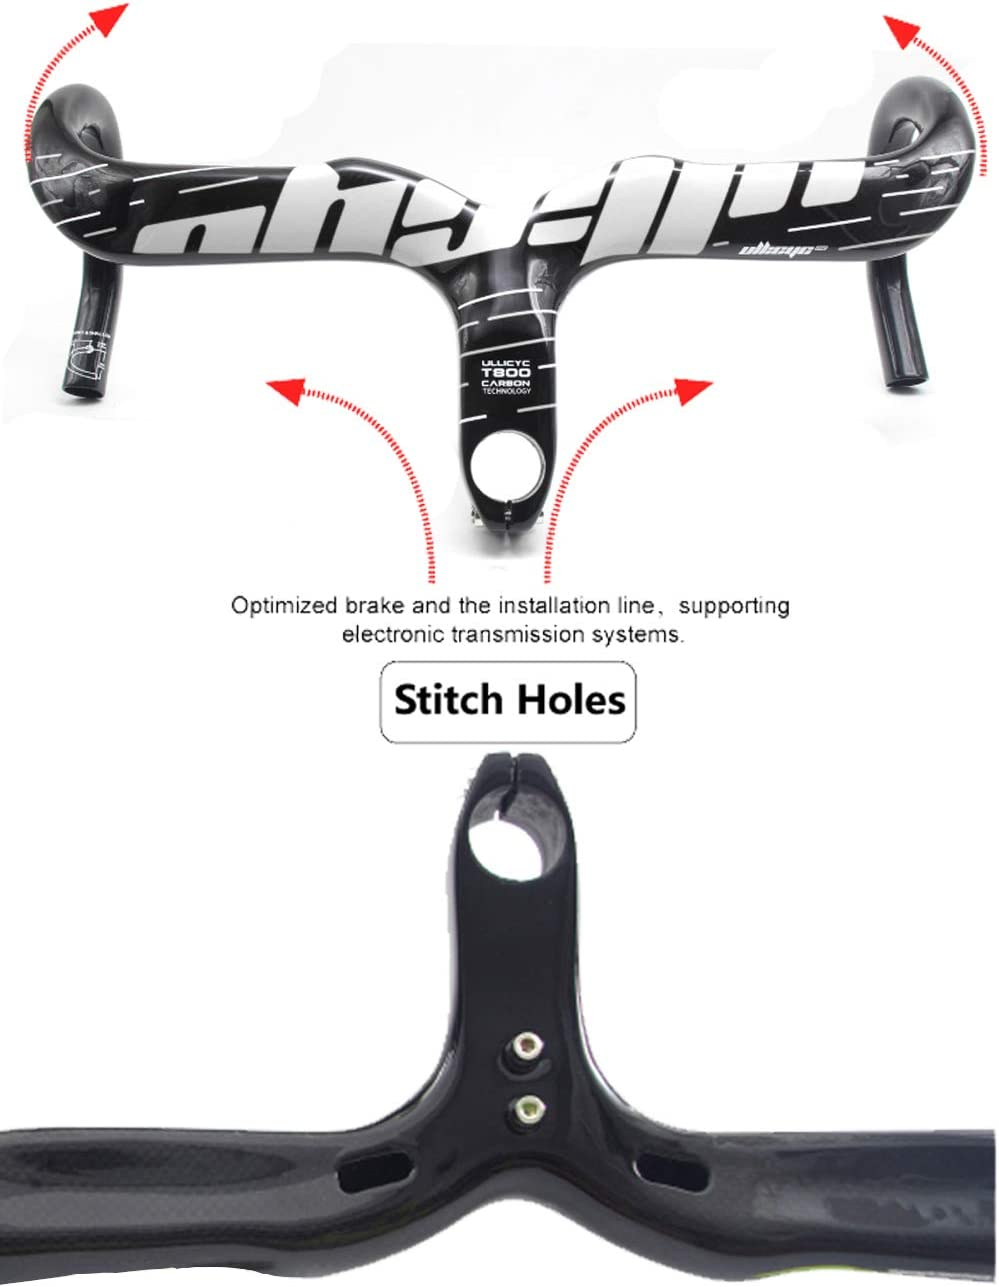 la Fibra de Carbono de Bicicletas Aero Integrado Manillar Ligero de 28,6 mm Gota Bares de Carretera Plegable Ciclismo,Matte,90X400mm Pn&cc Manillar de Carbono para el Camino de la Bicicleta